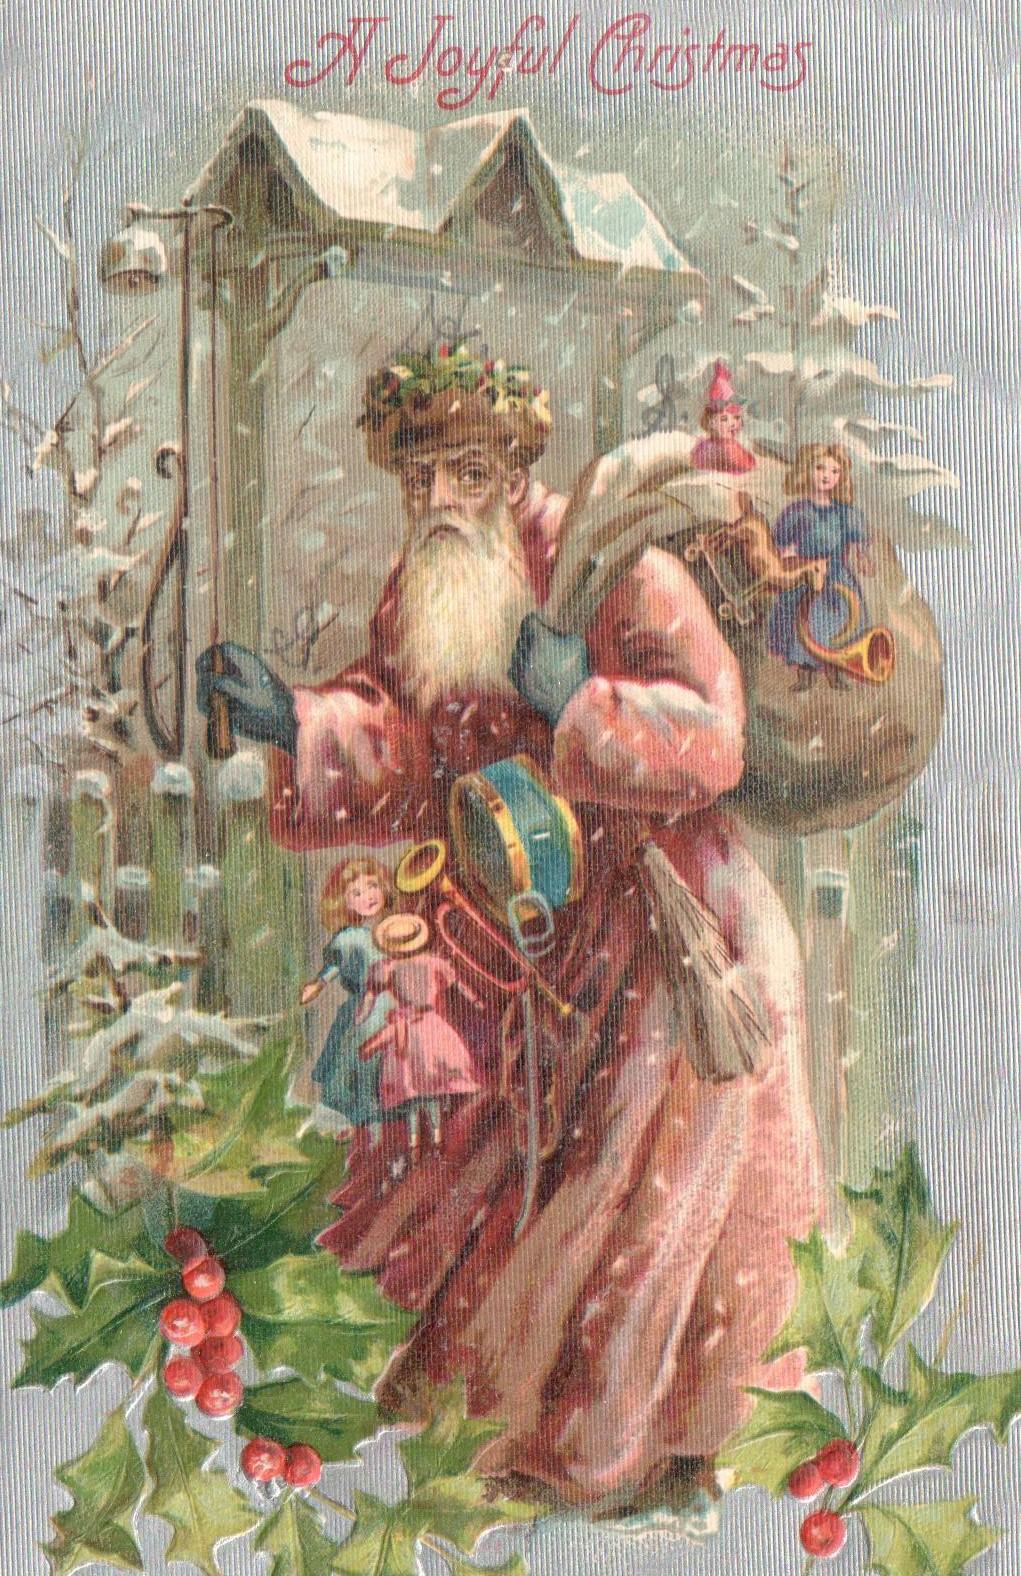 A-Joyful-Christmas-printed-in-Germany-ca 1908